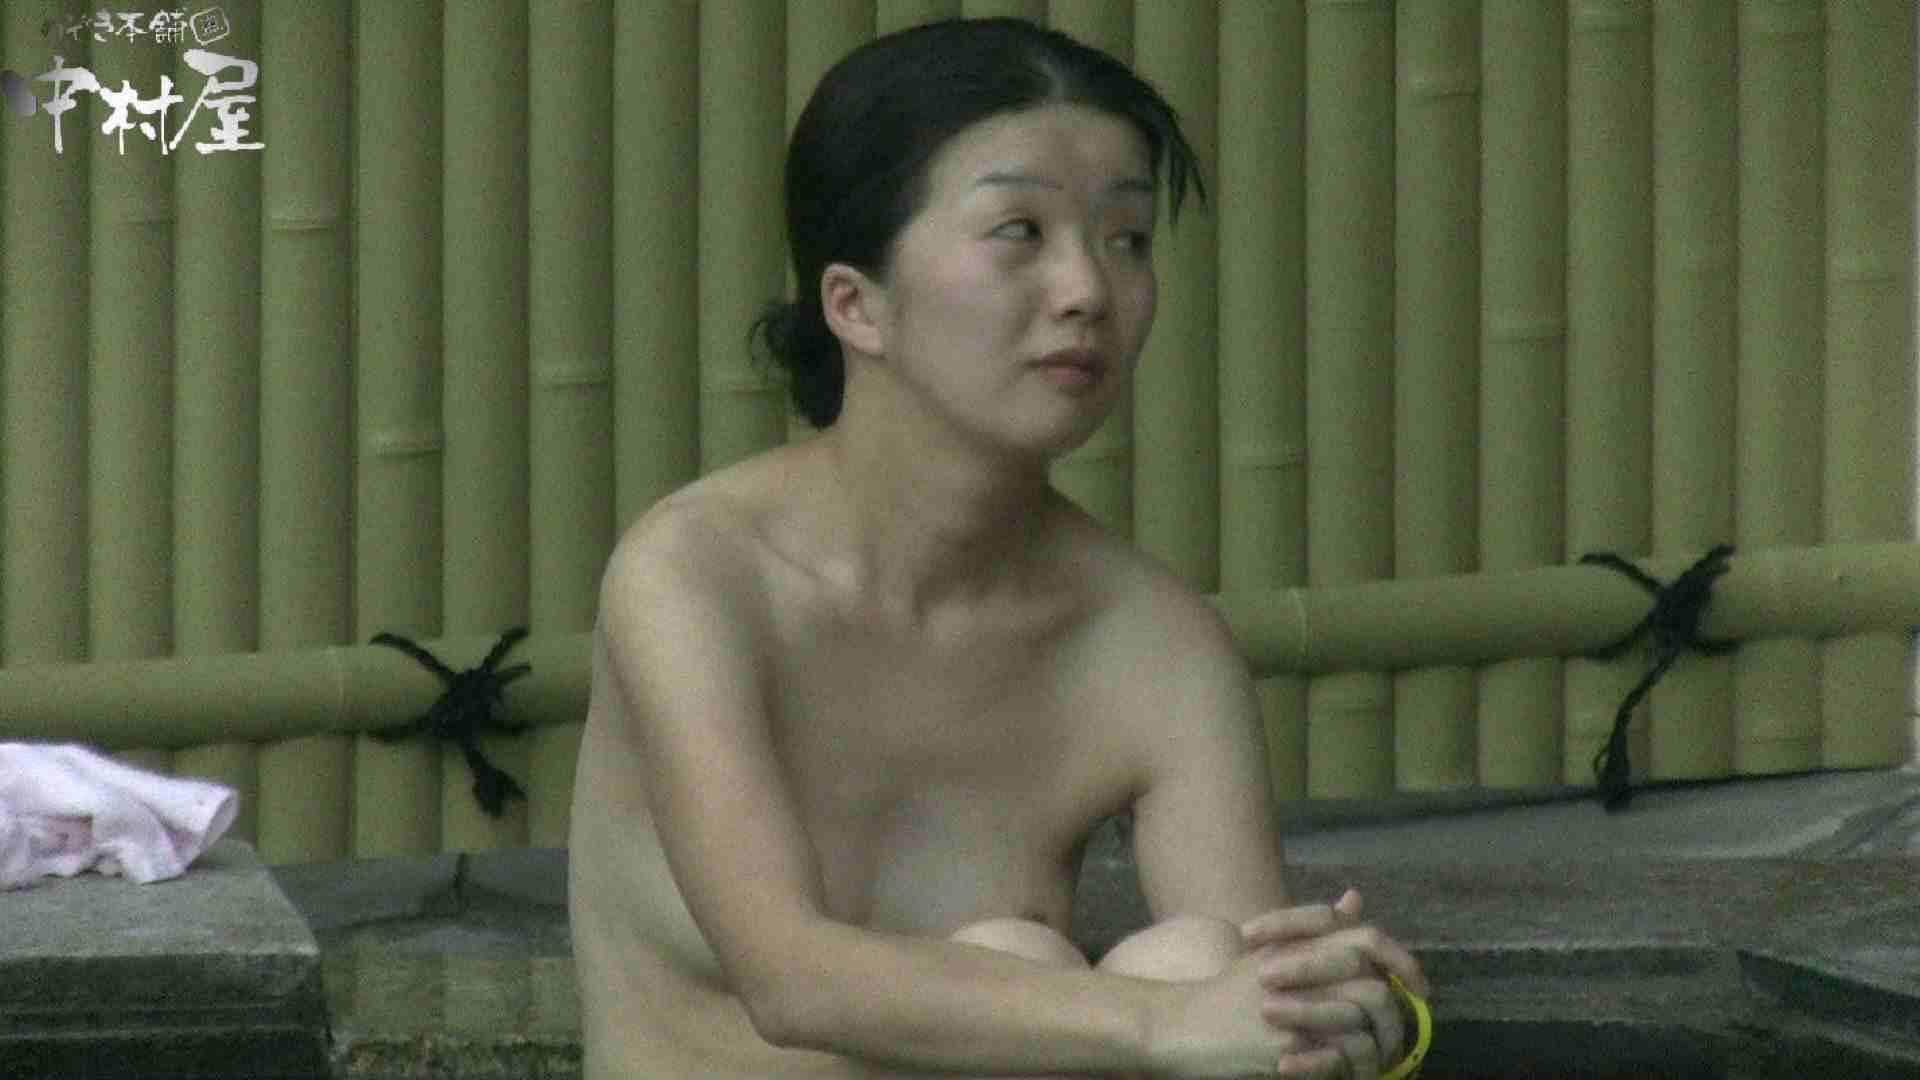 Aquaな露天風呂Vol.904 美しいOLの裸体 オメコ動画キャプチャ 103pic 77